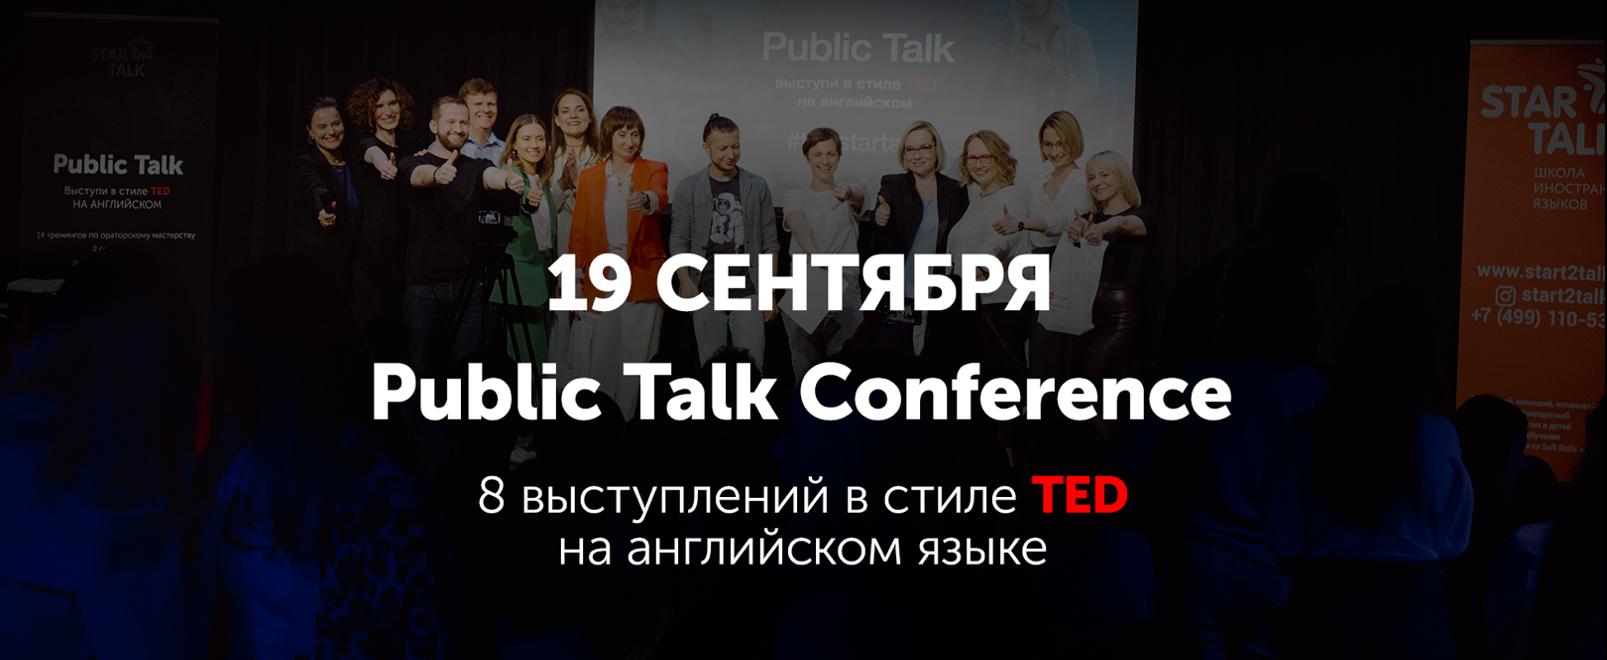 Public Talk Conference в Москве